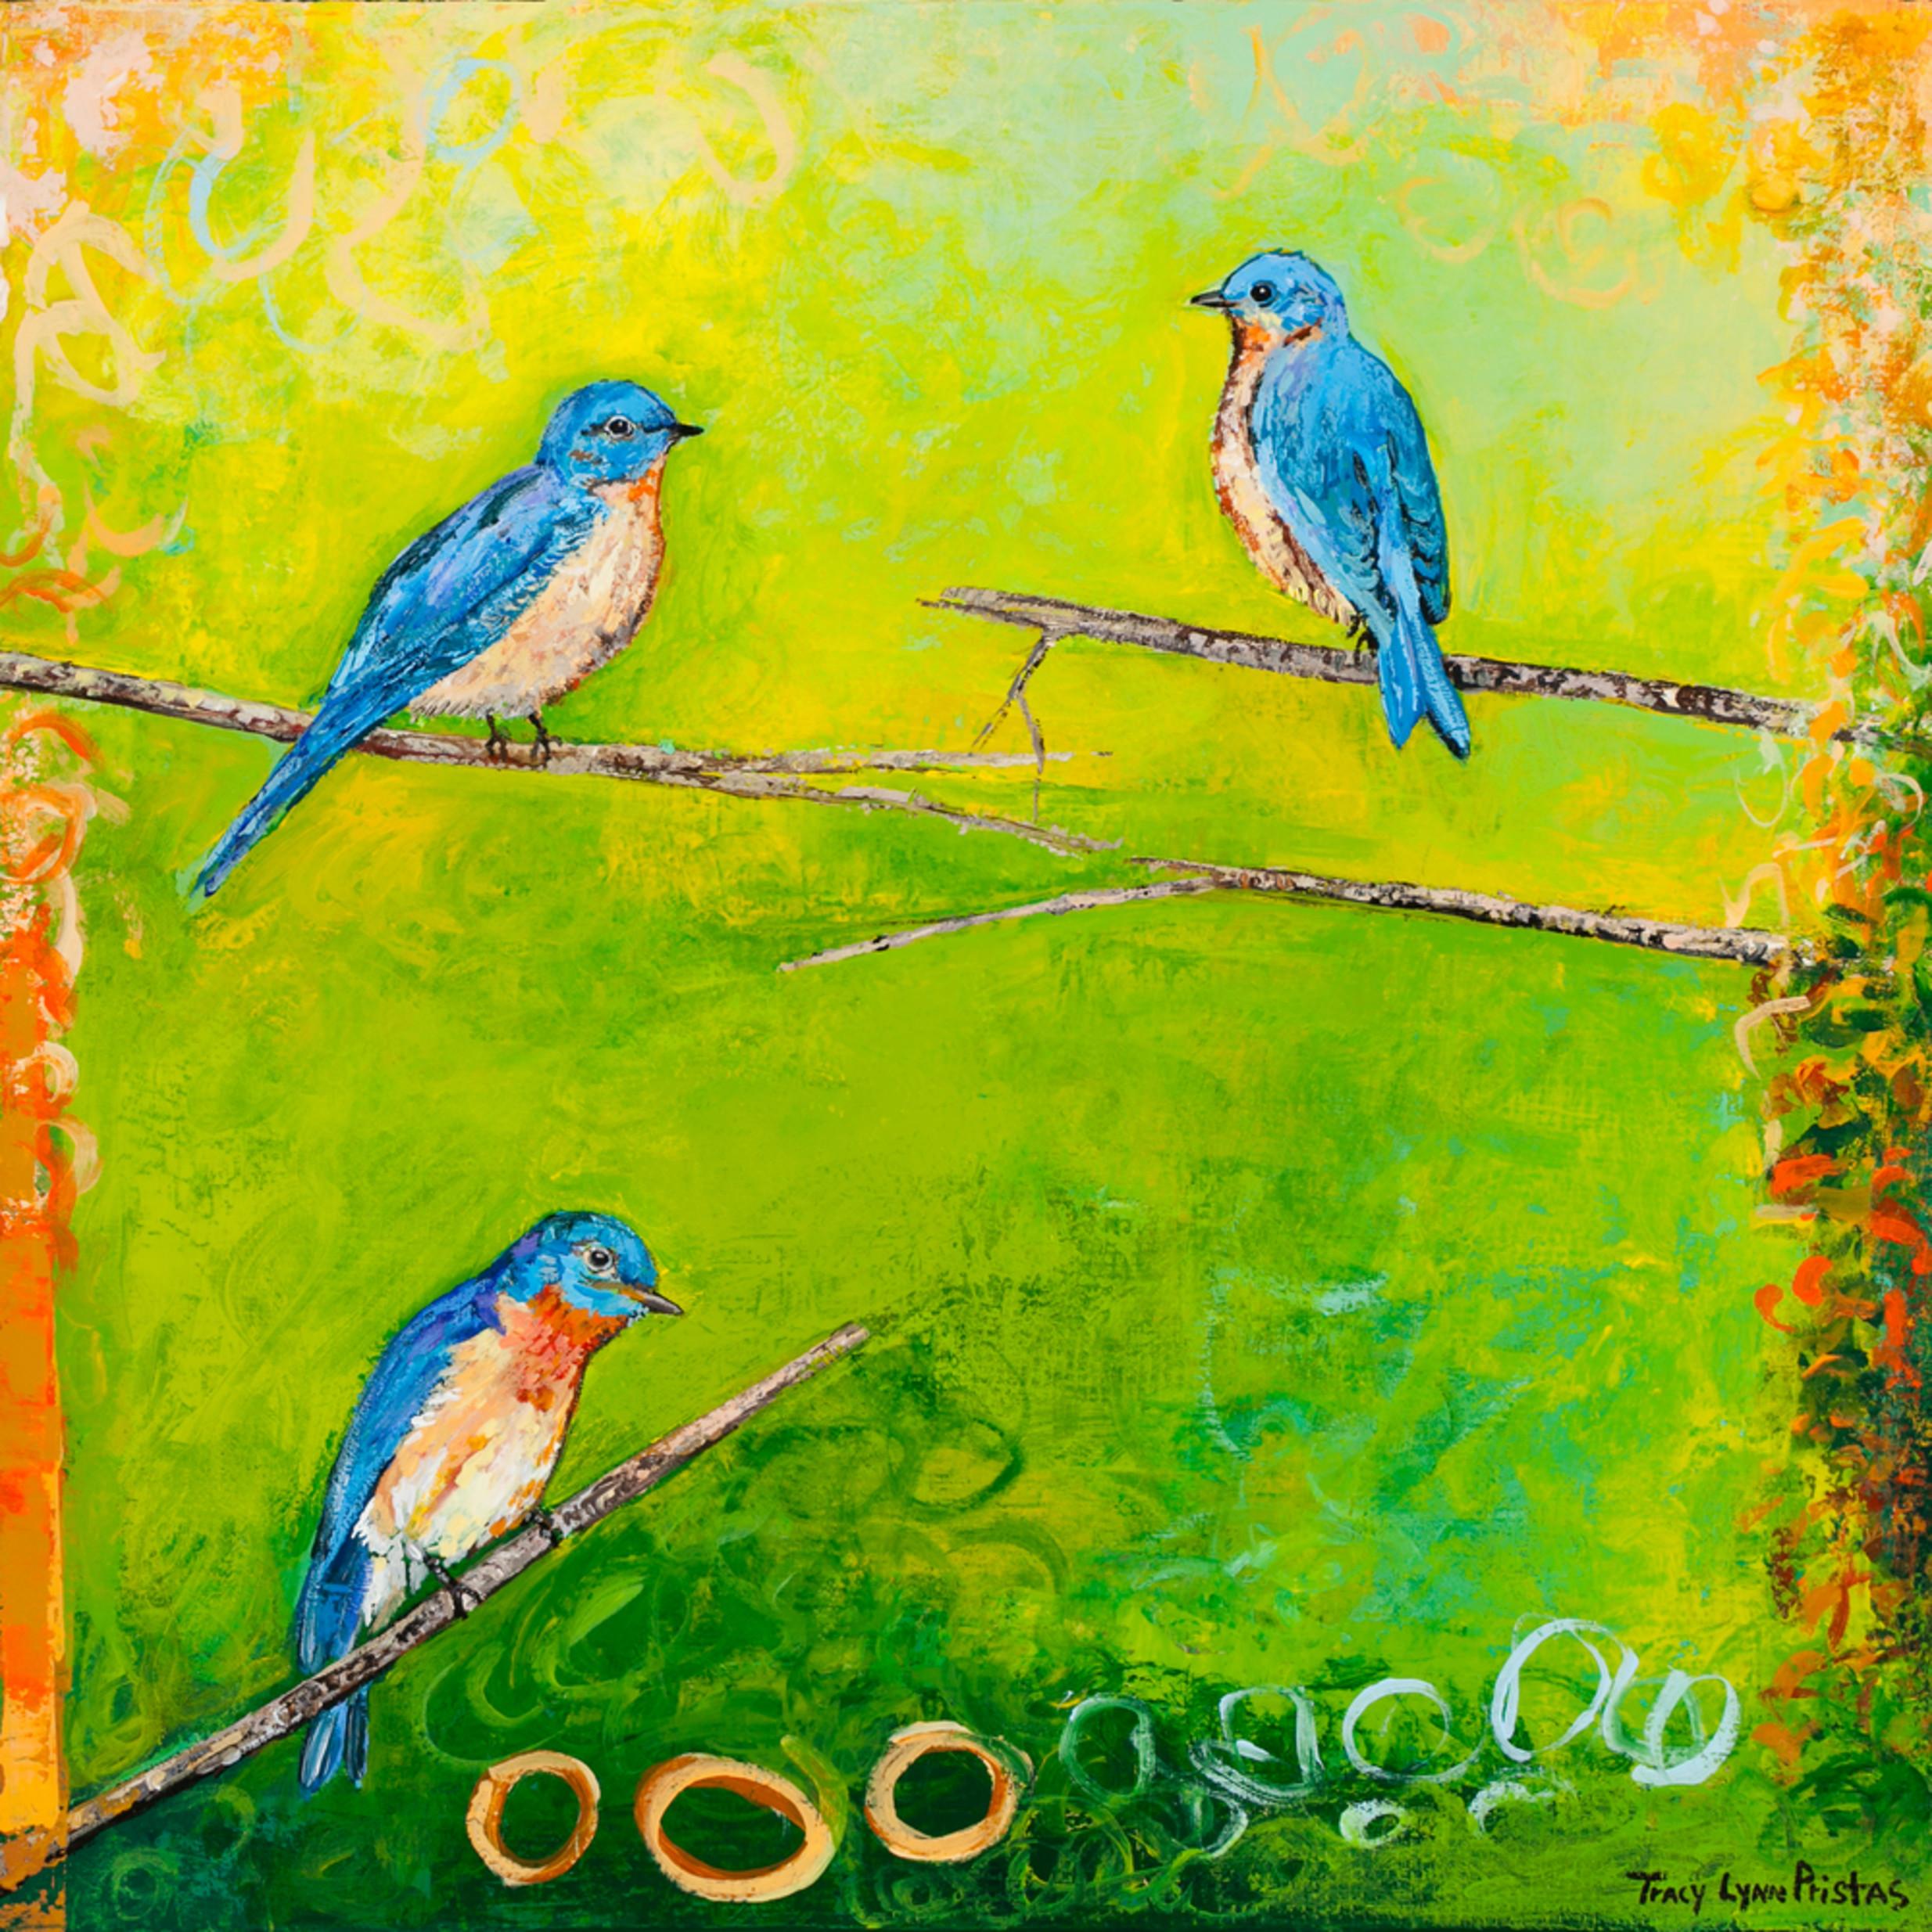 Blue bird art blue bird paintings shop tracy lynn pristasjpg lt6lsj